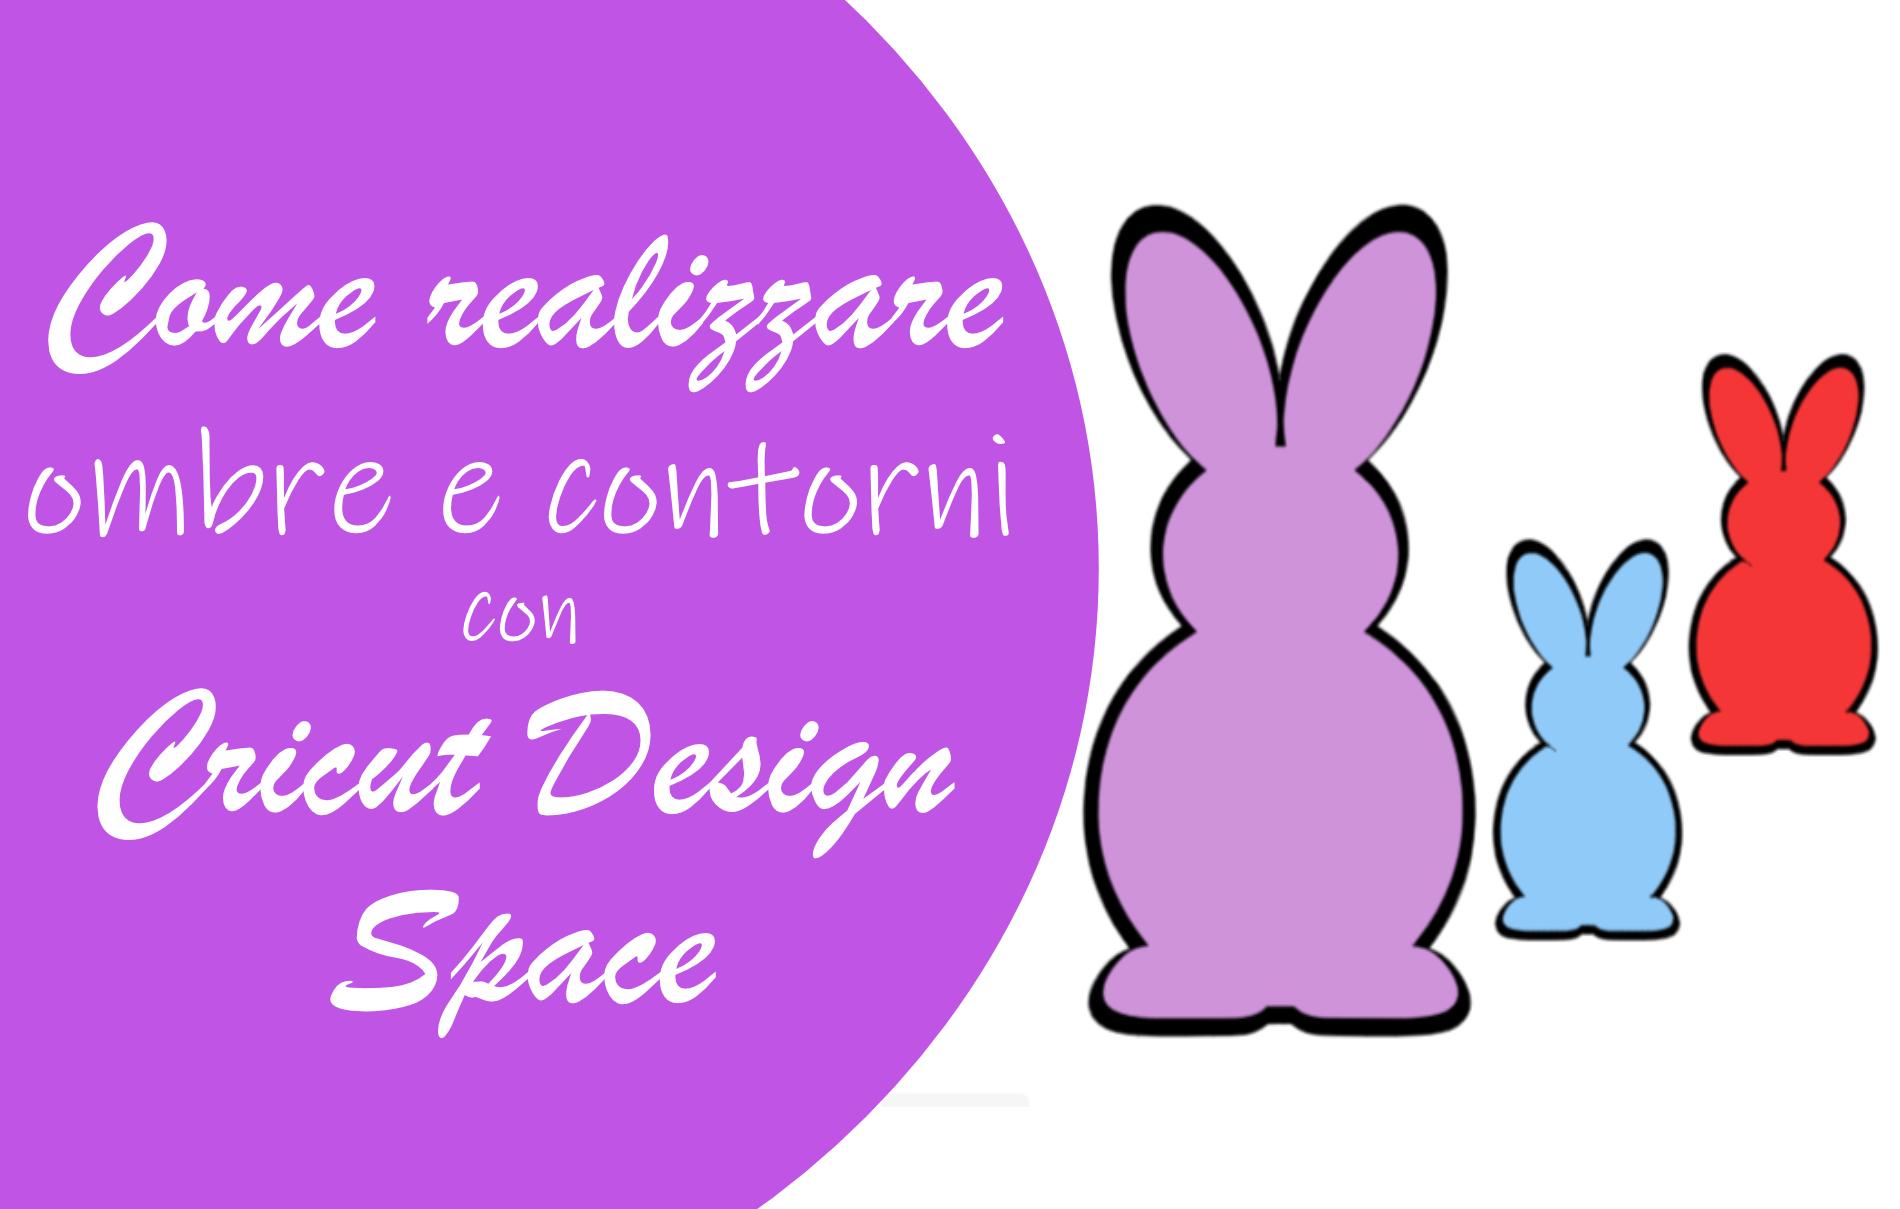 Ombre Cricut Design Space